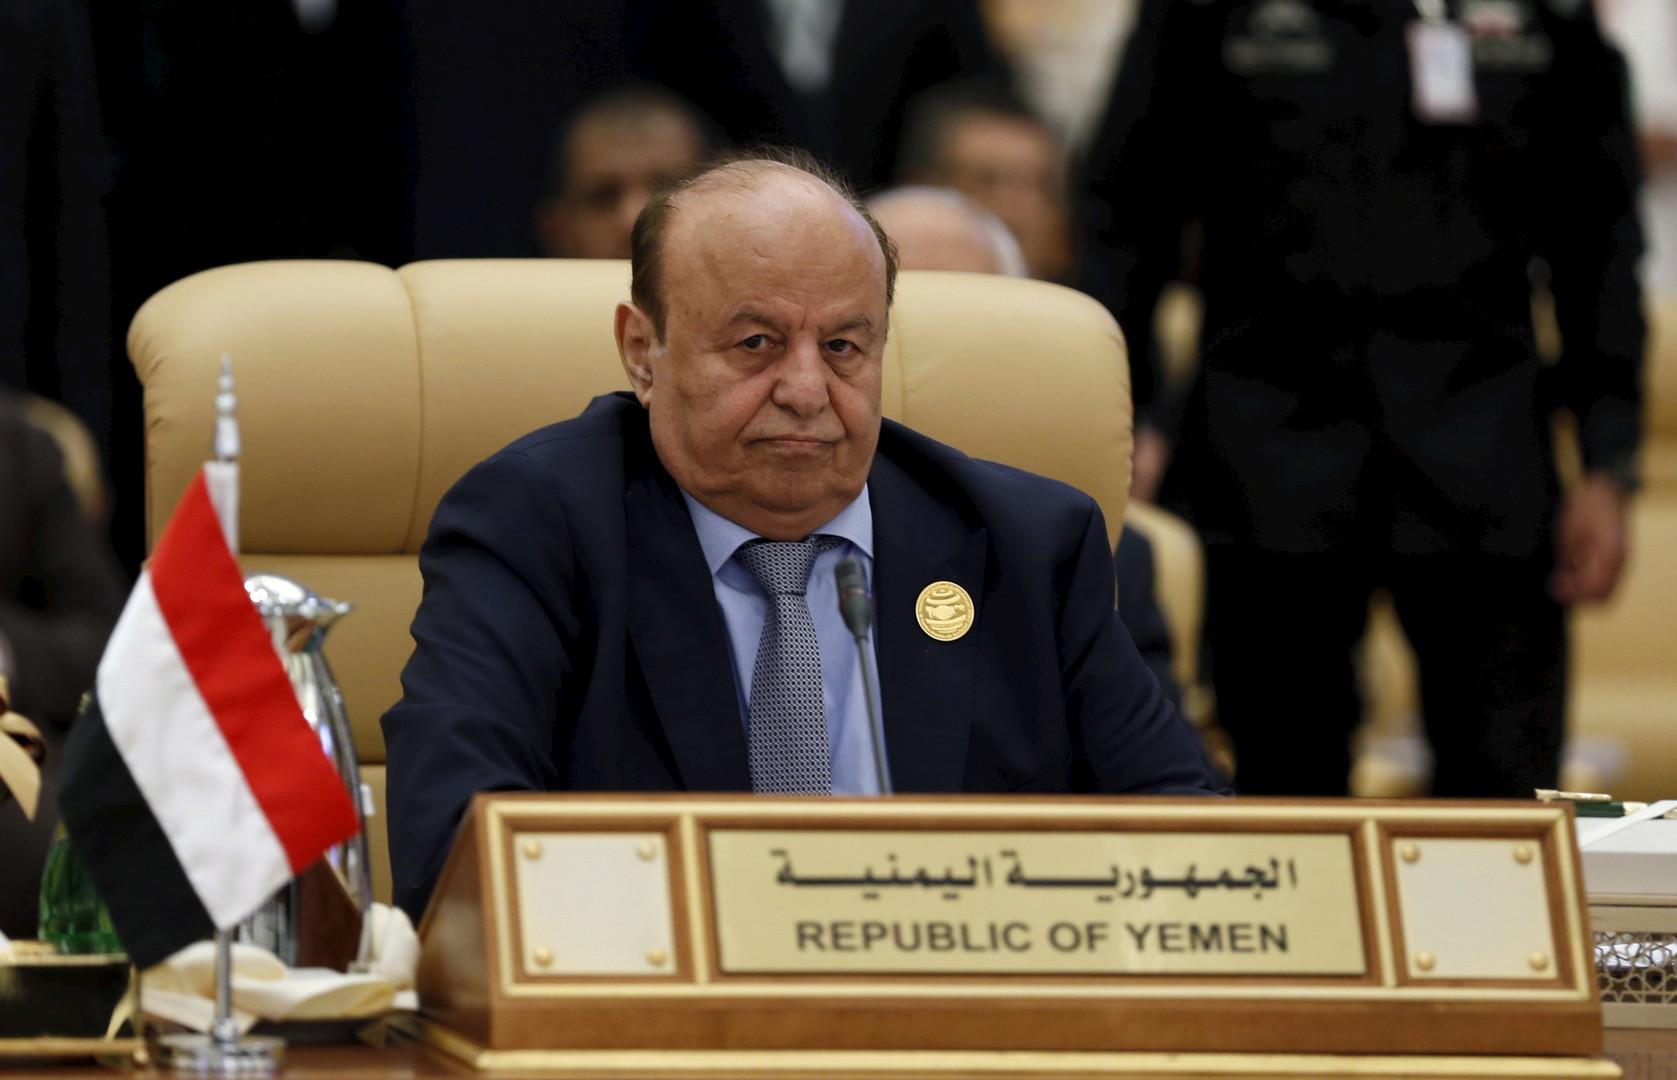 Abd Rabbo Mansour Hadi à Riyad